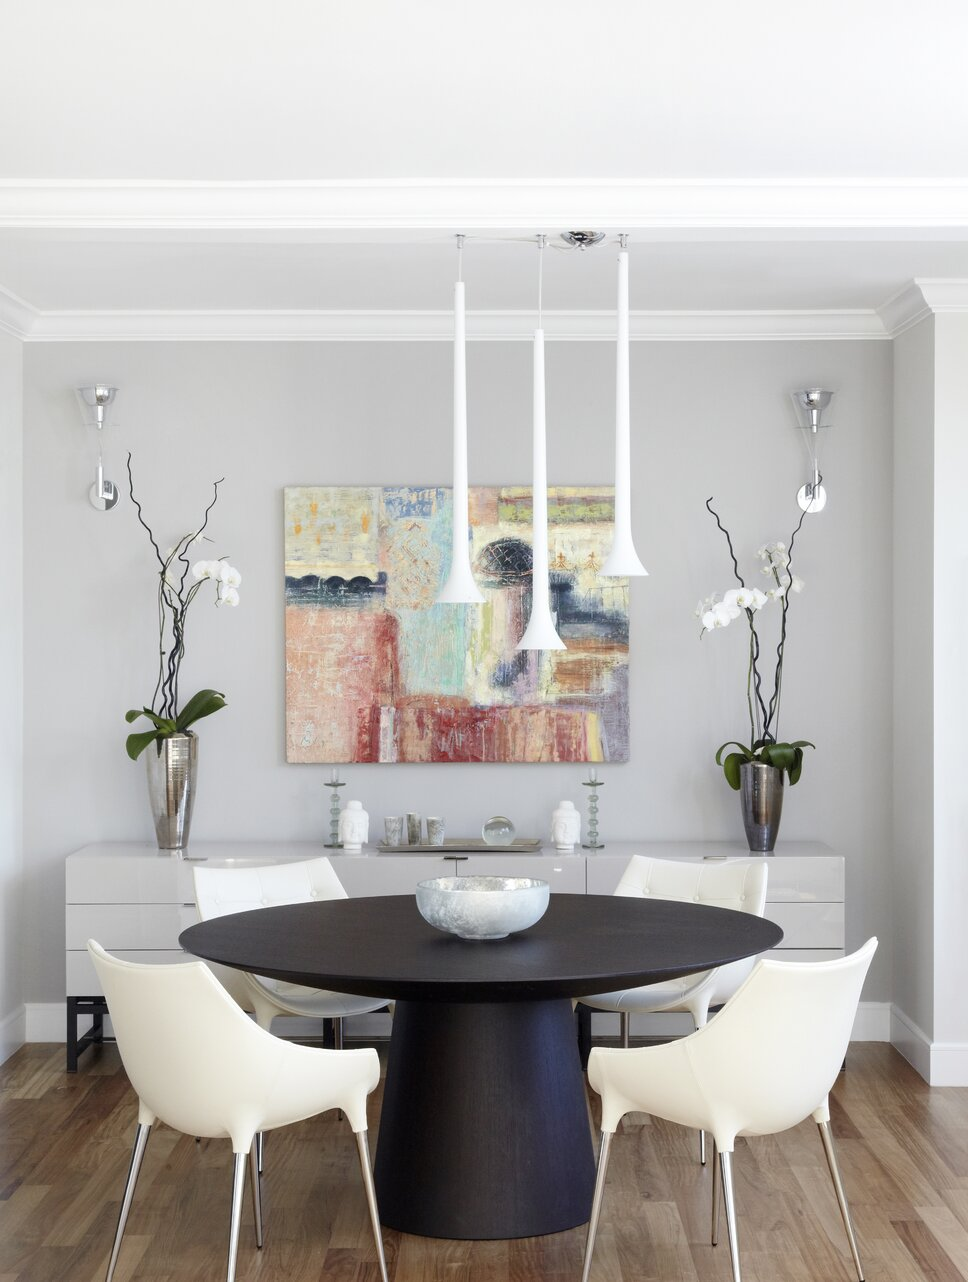 marili forastieri Modern Dining Room design